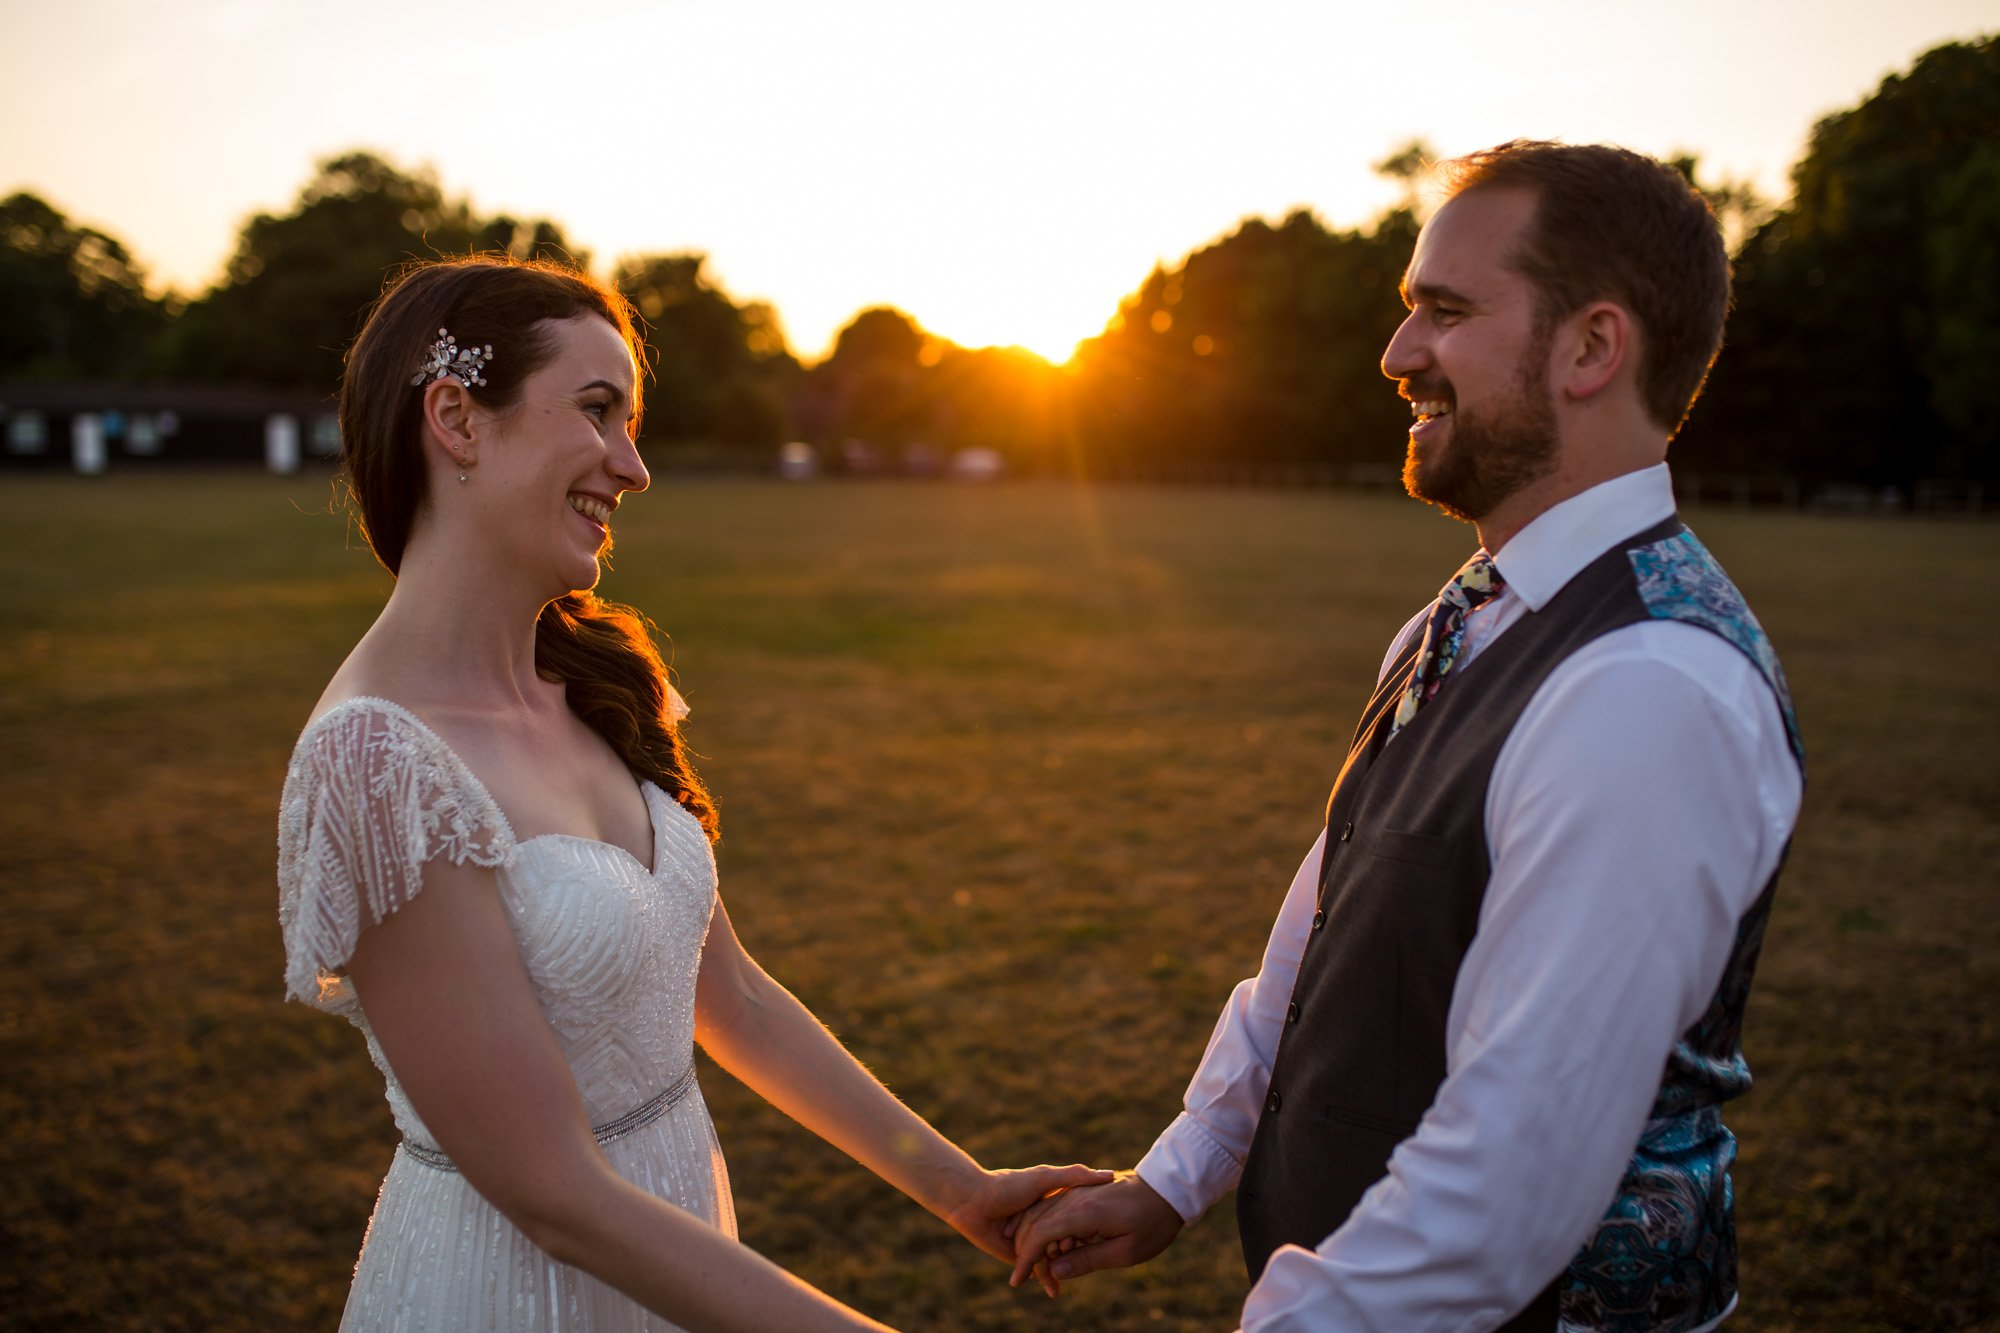 Hertfordshire wedding photographer, Cottered Village Hall, sunset portrait